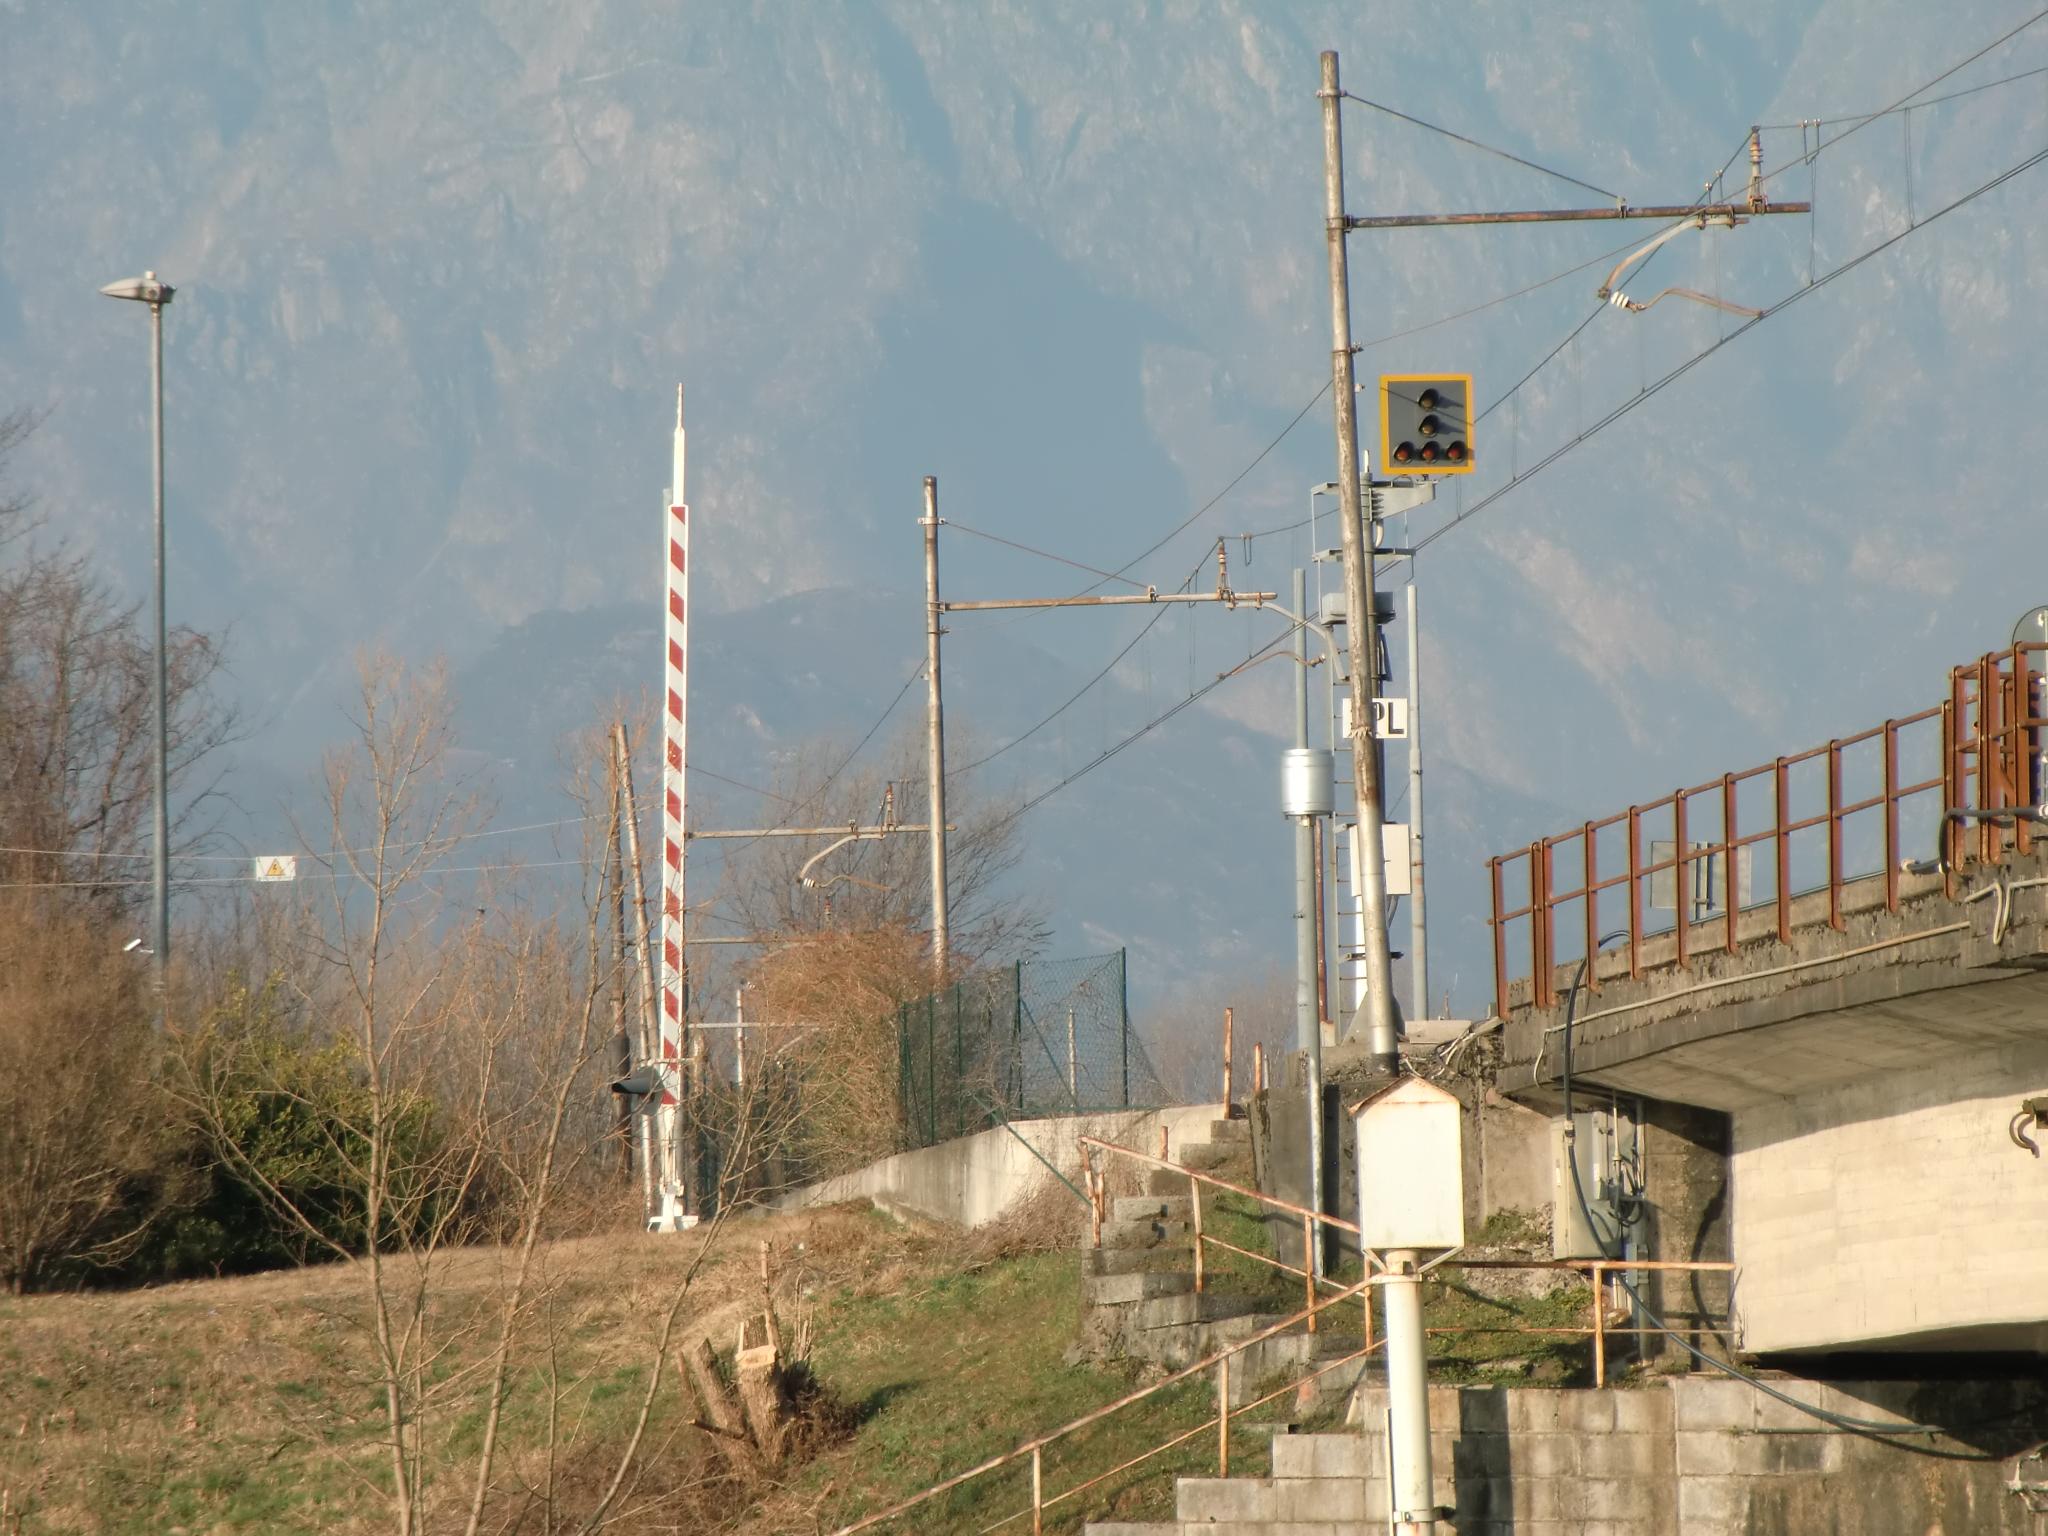 Valtellina, Valchiavenna, Orobie e Lario: MARZO 2017-cimg7178.jpg